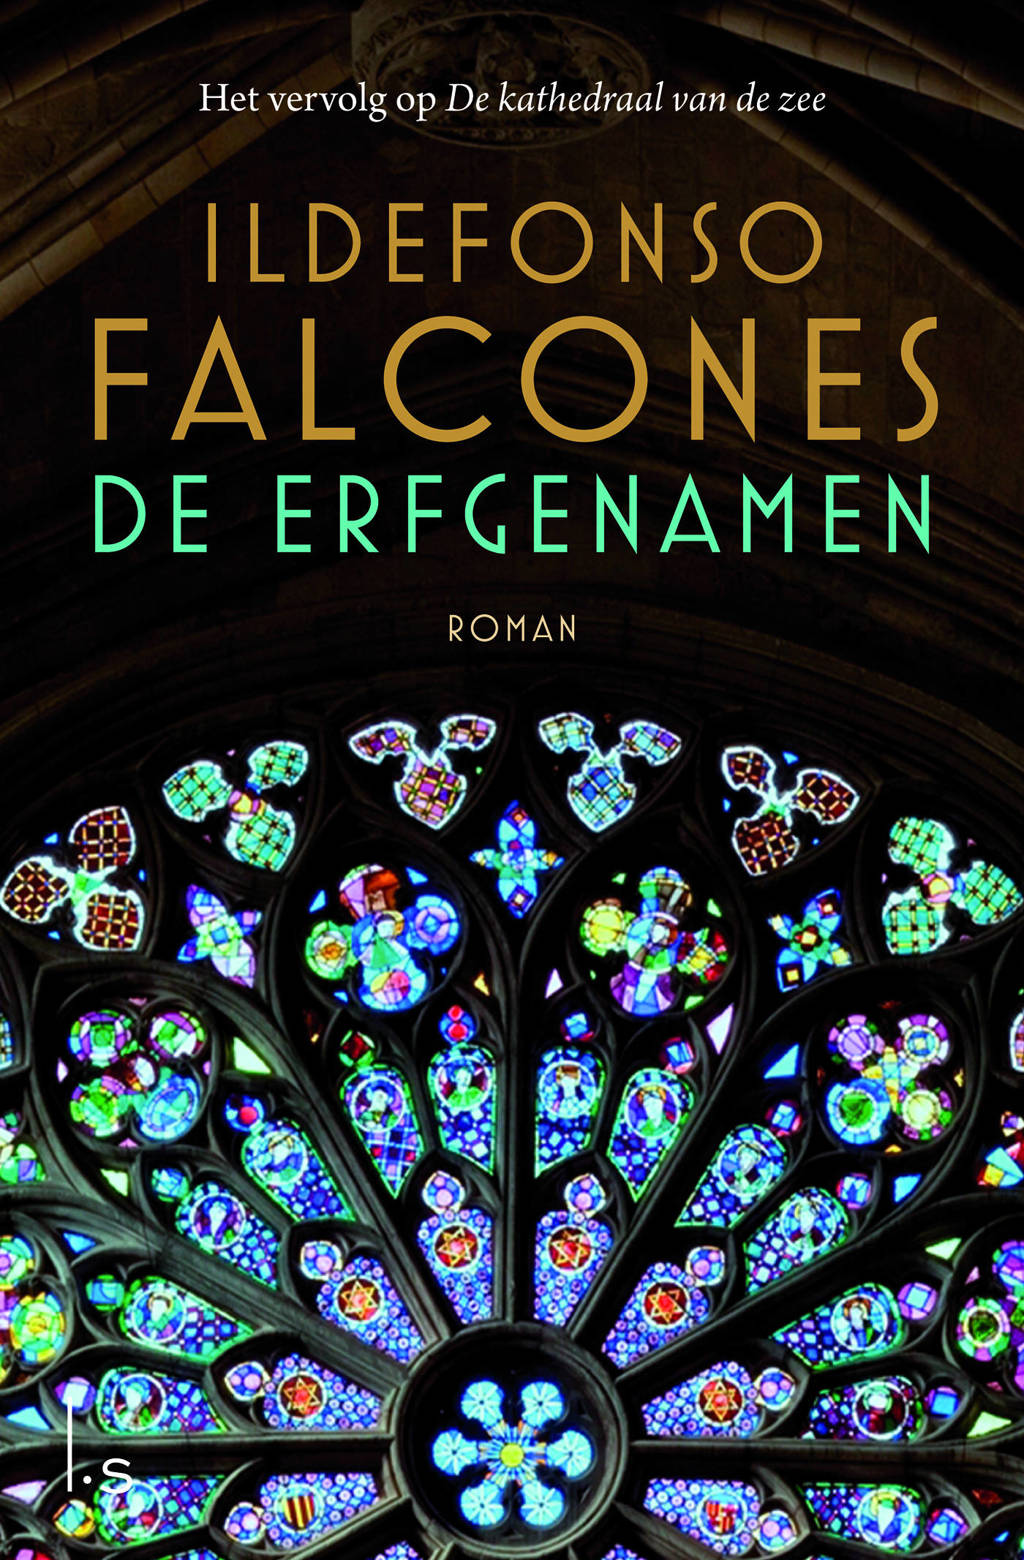 De erfgenamen - display 15 ex - Ildefonso Falcones